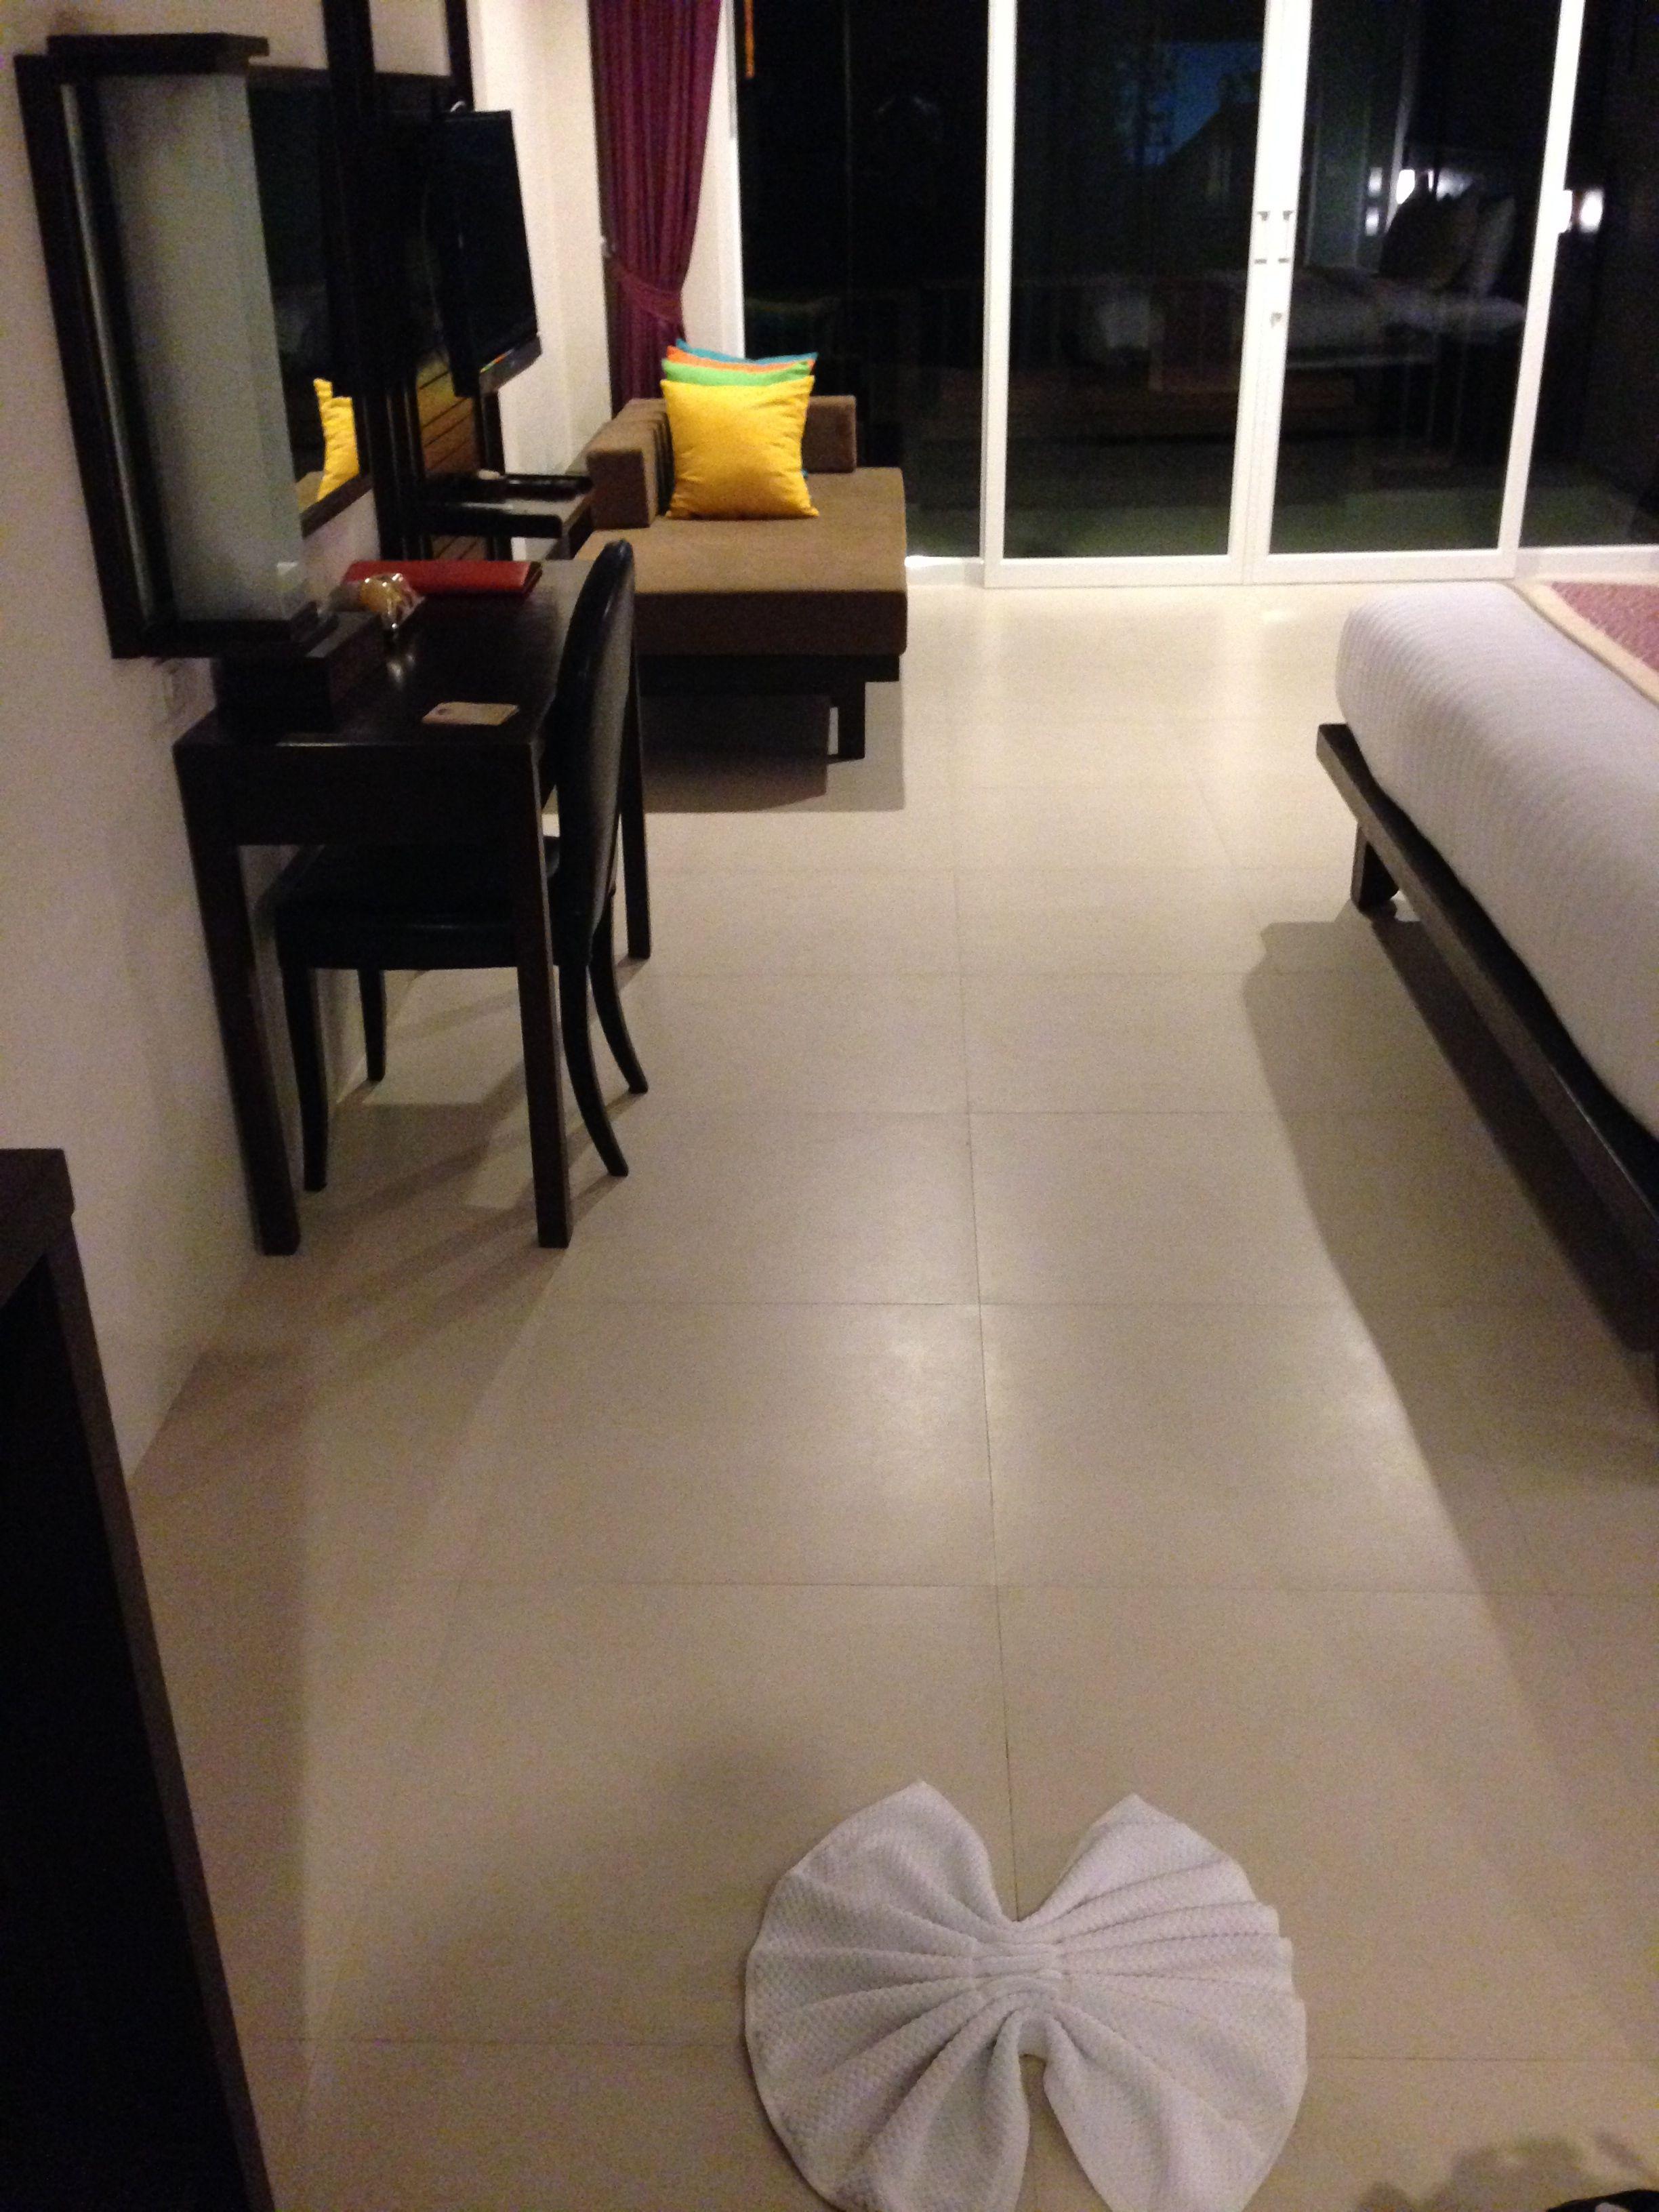 sand sea resort railay bay trip report pictures03 - Medium Hardwood Hotel 2015